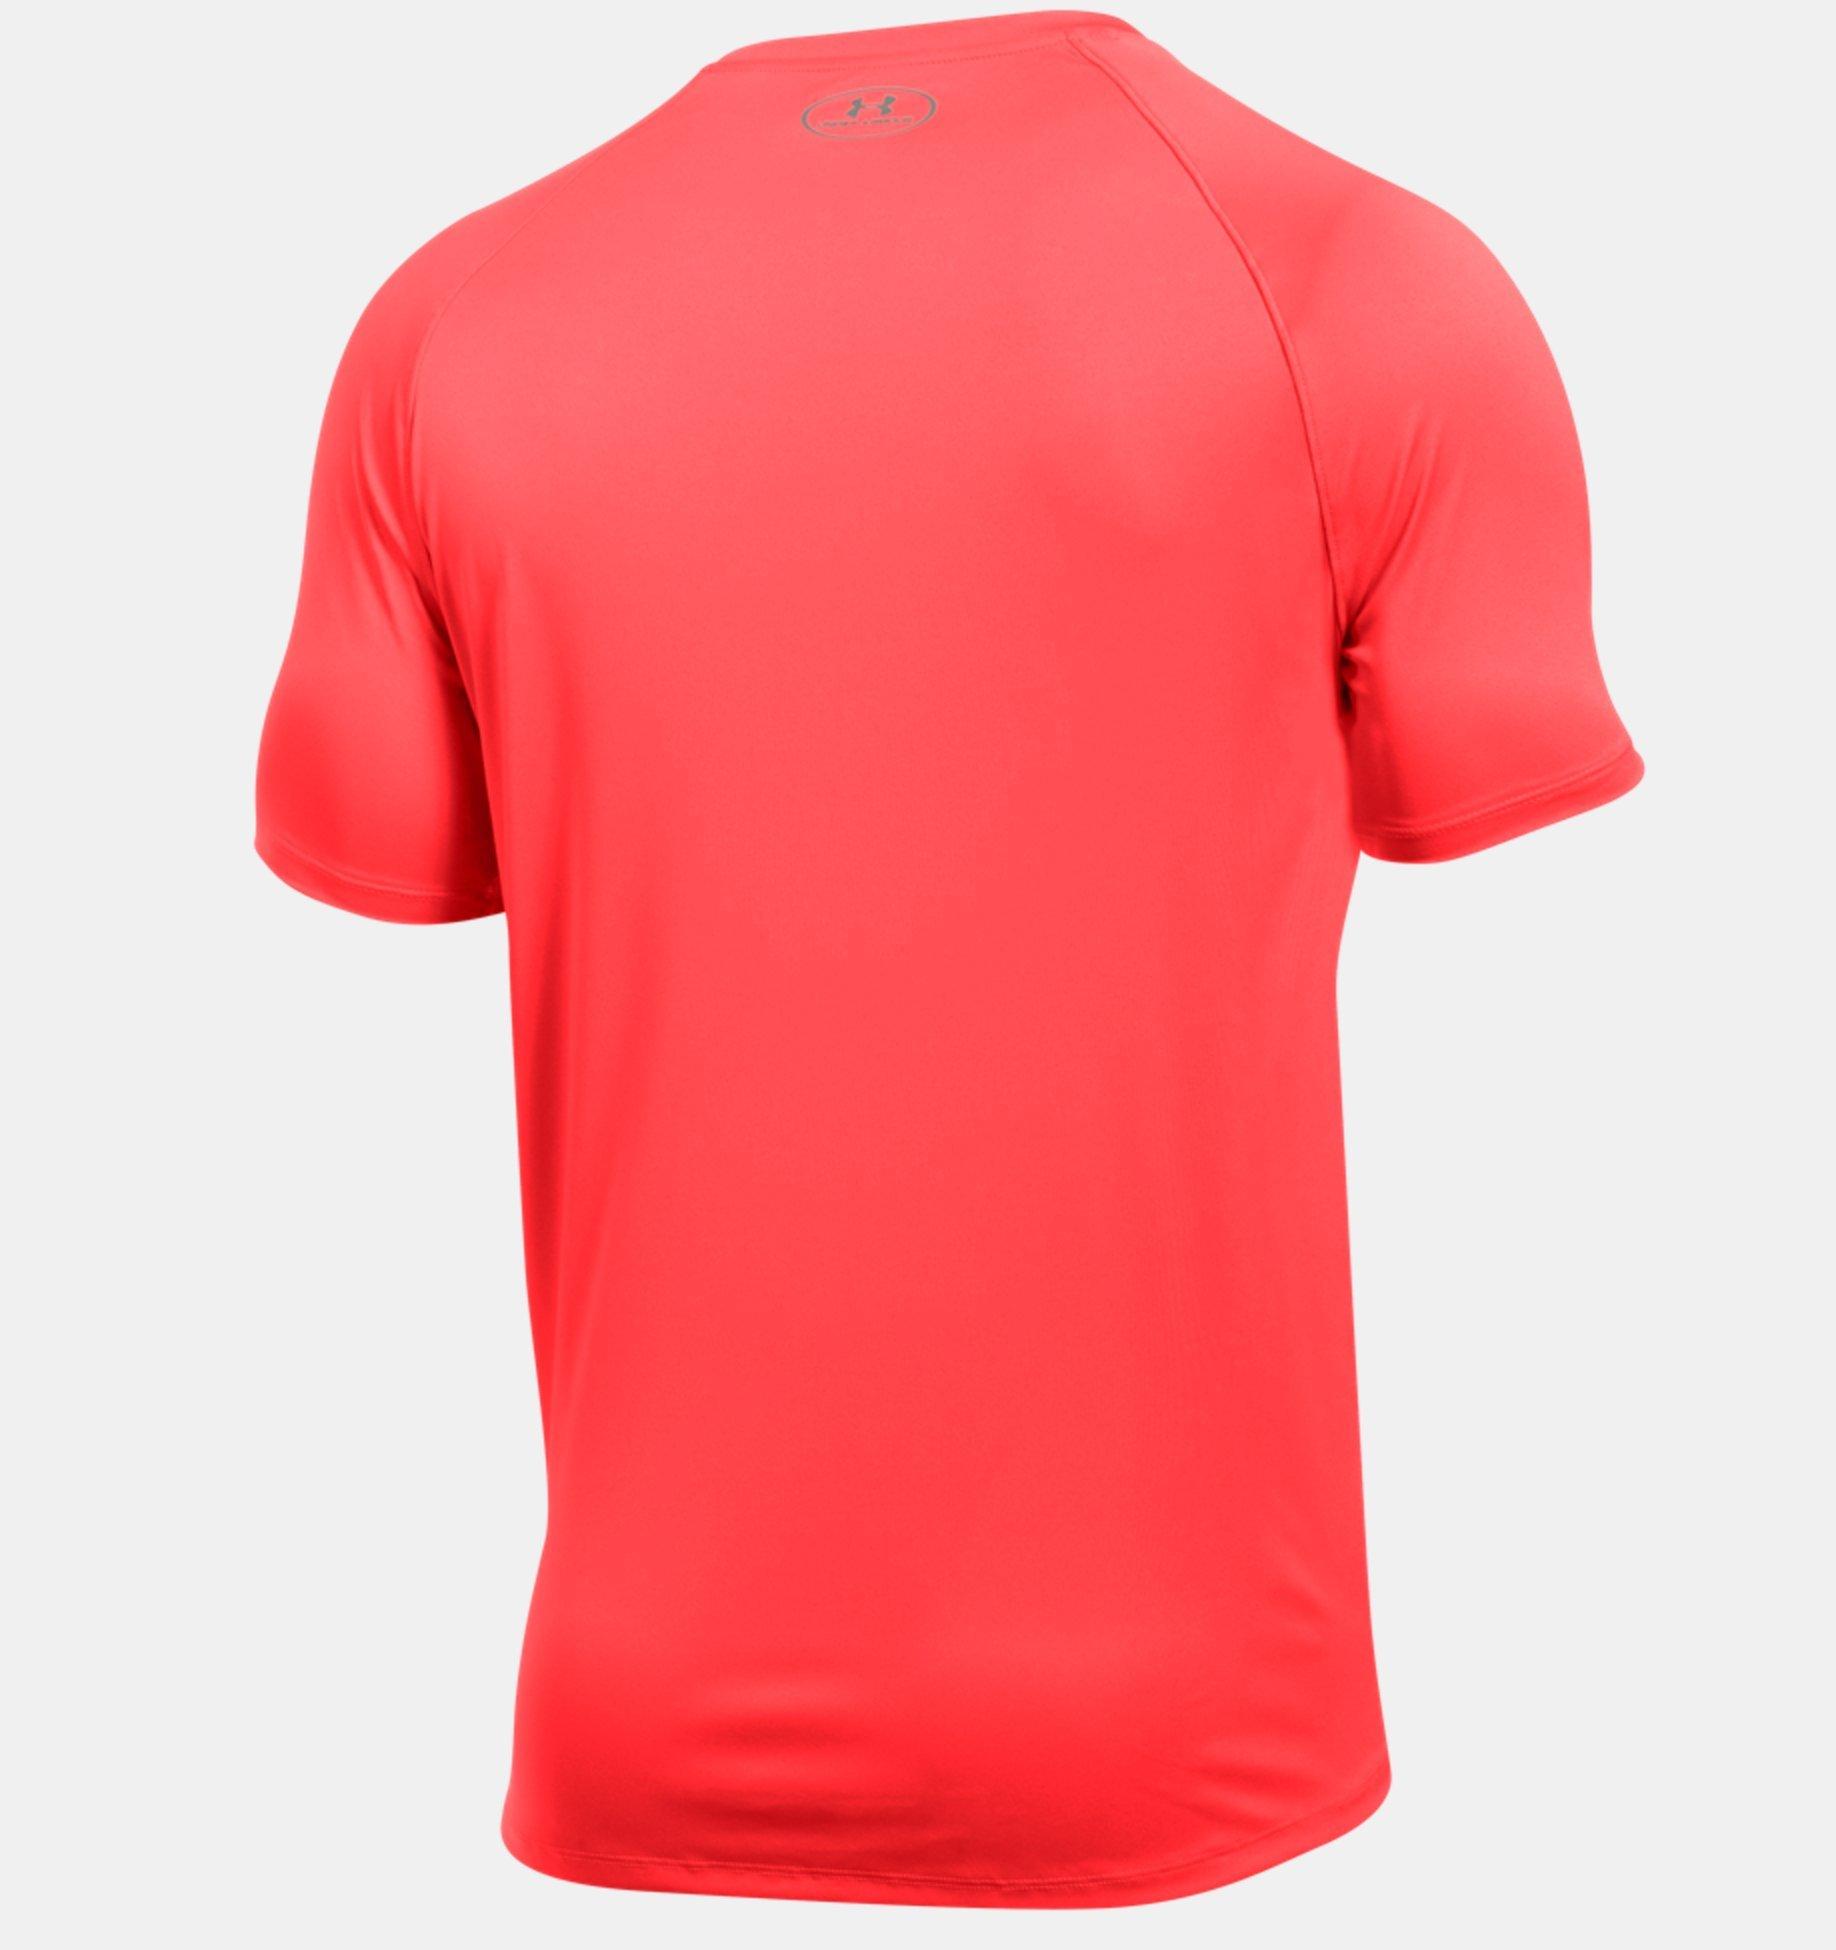 Under Armour Men's Speed Stride Short Sleeve, Marathon Red, X-Large by Under Armour (Image #1)